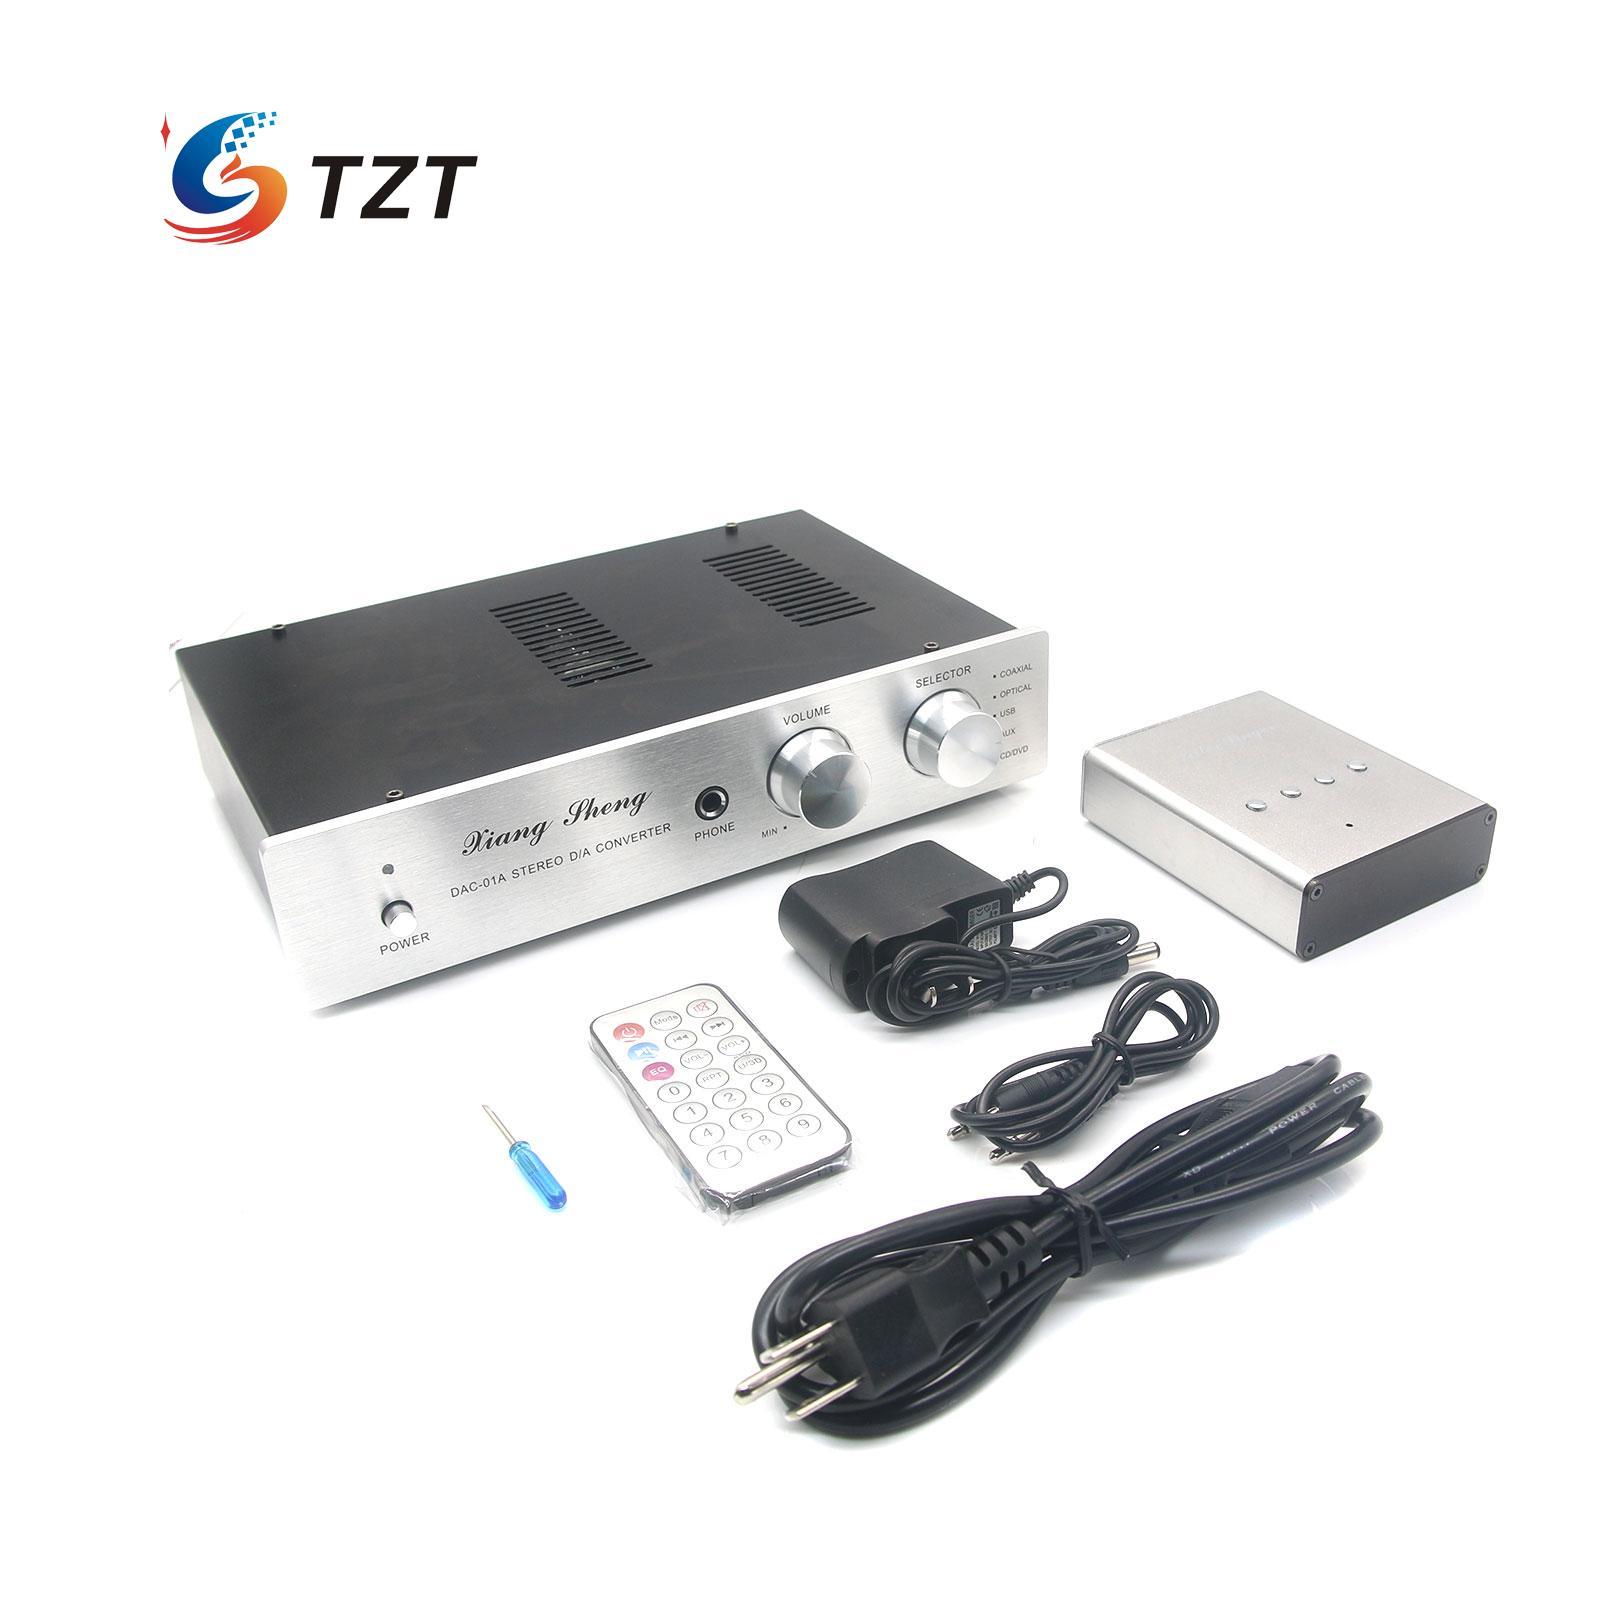 XiangSheng DAC-01A DAC Amplifier XMOS-U8 USB with Bluetooth Receiver Audio AMP Silver/Black audia flight three s usb dac silver